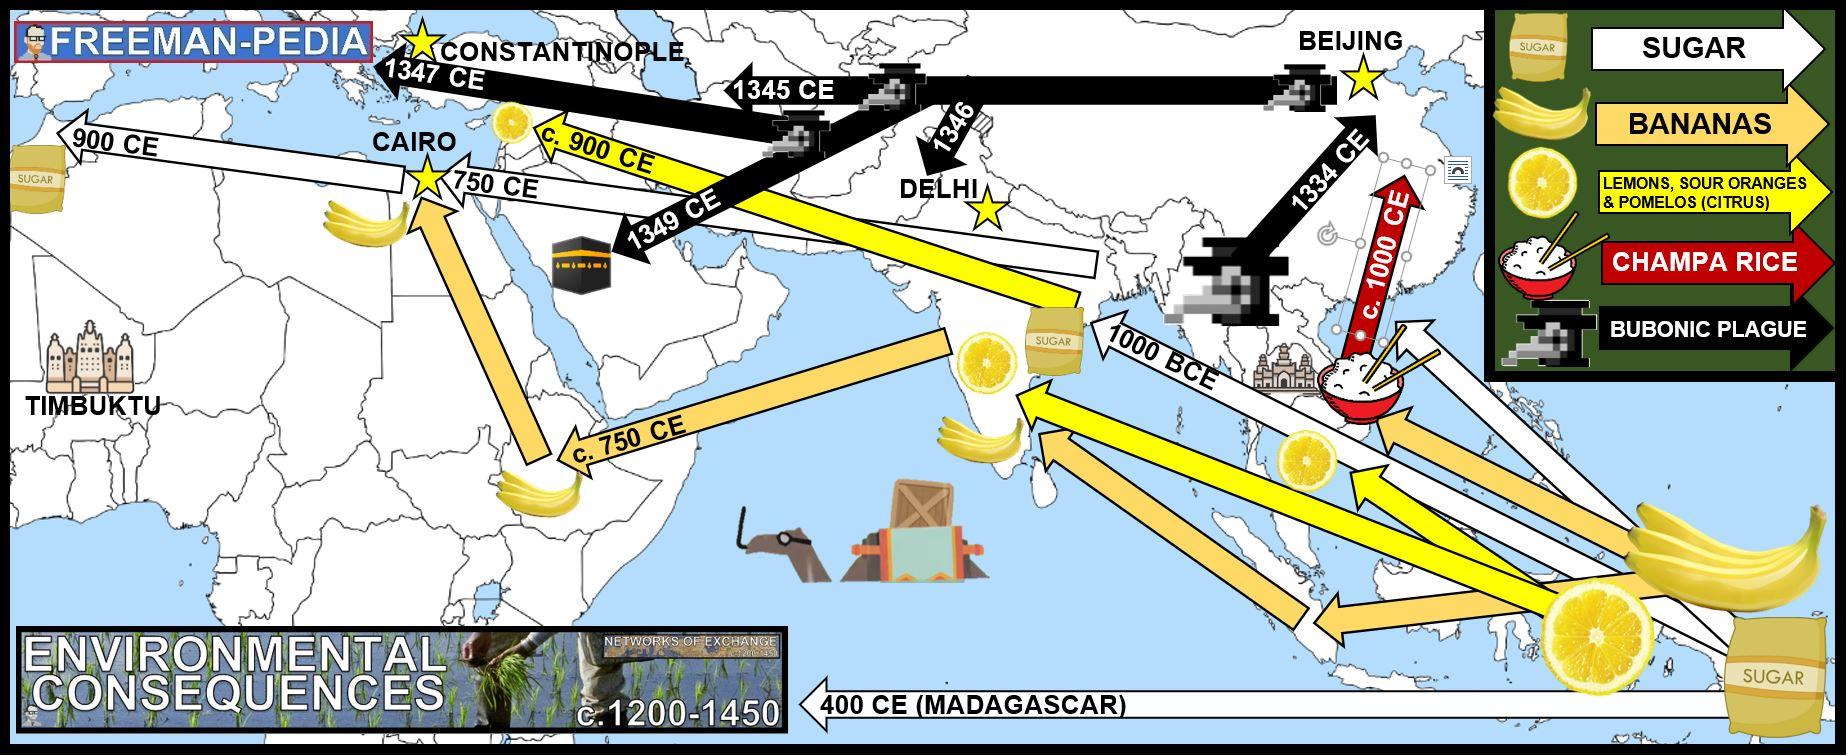 ENVIRONMENTAL CONSEQUENCES MAP NETWORKS OF EXCHANGE AP WORLD HISTORY FREEMANPEDIA MODERN.JPG